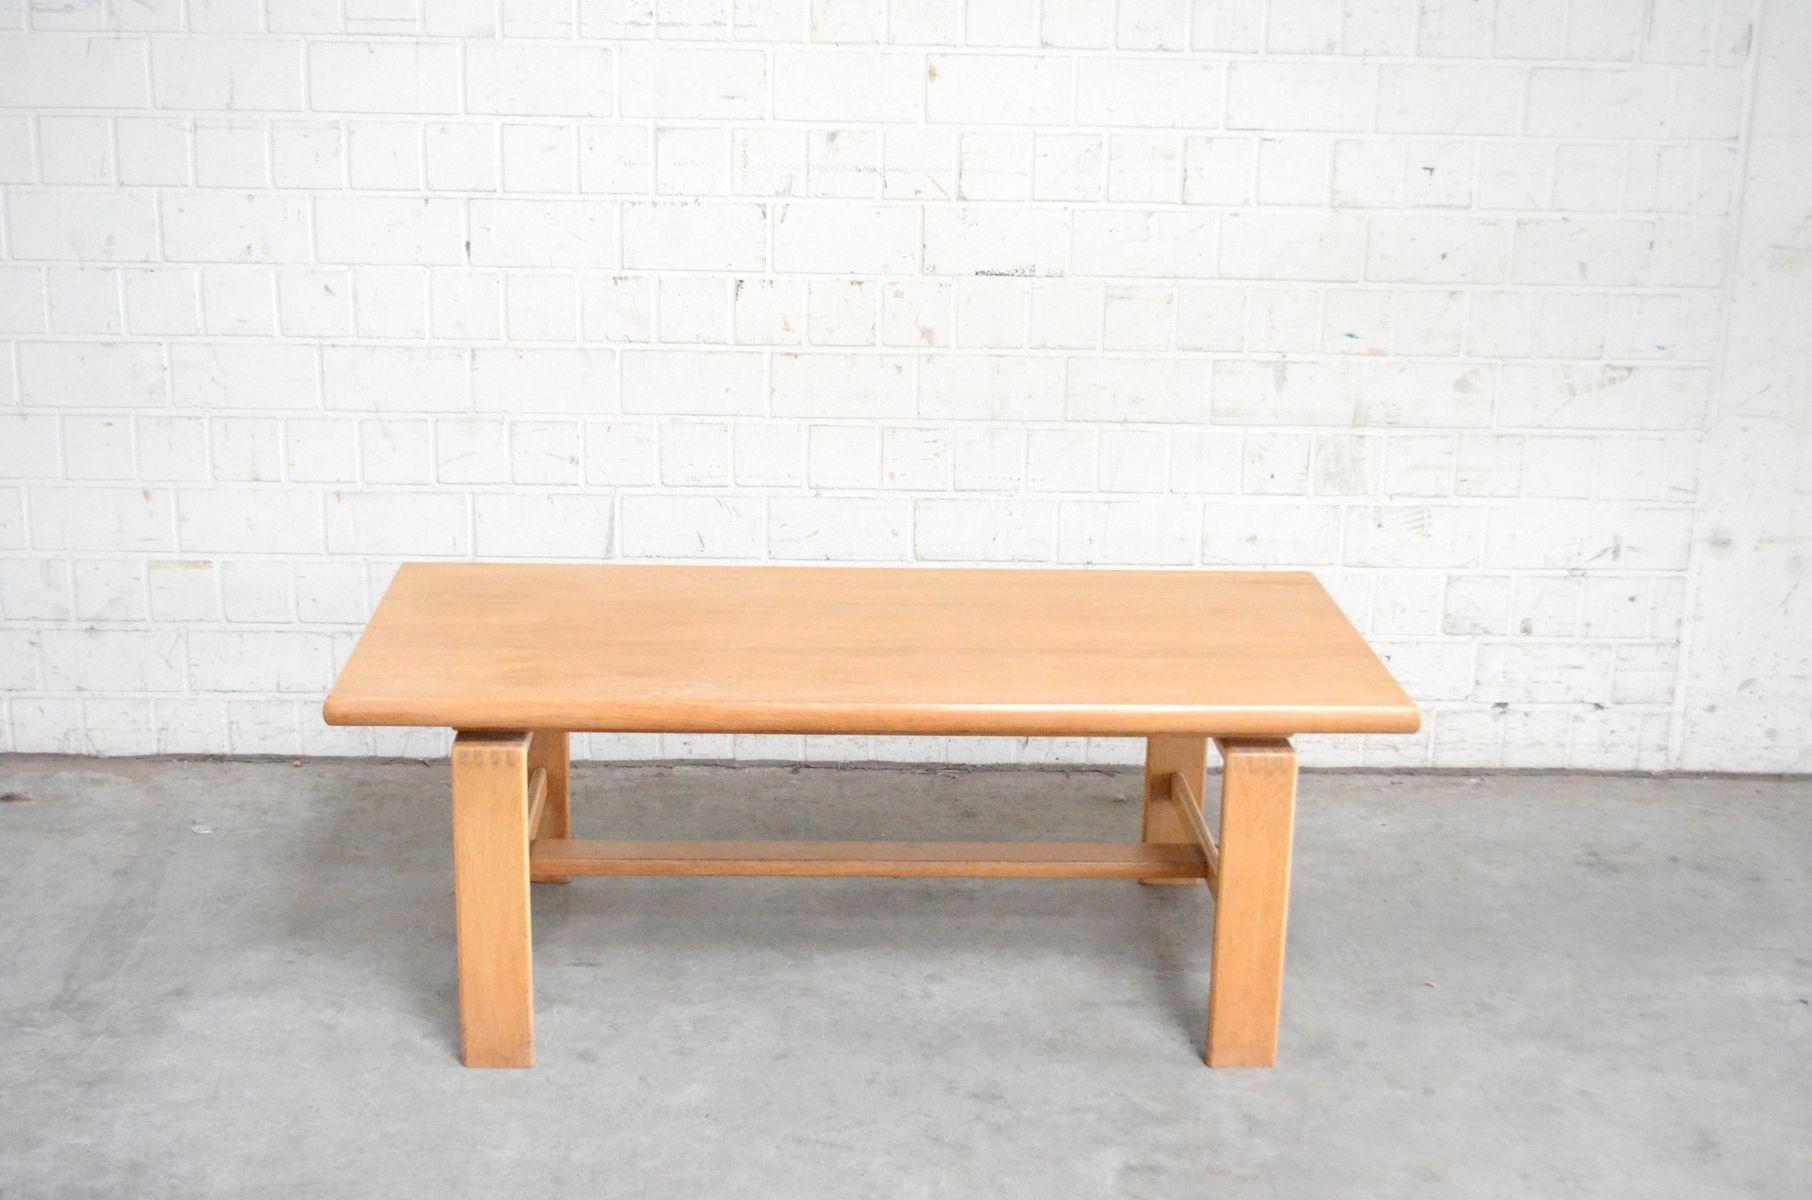 Beistelltisch Holz Metall Runder Wohnzimmertisch Holz Couchtisch Rund Design Couchtisch Weiss Matt Hohenv Couchtisch Wohnzimmertisch Holz Wohnzimmertische